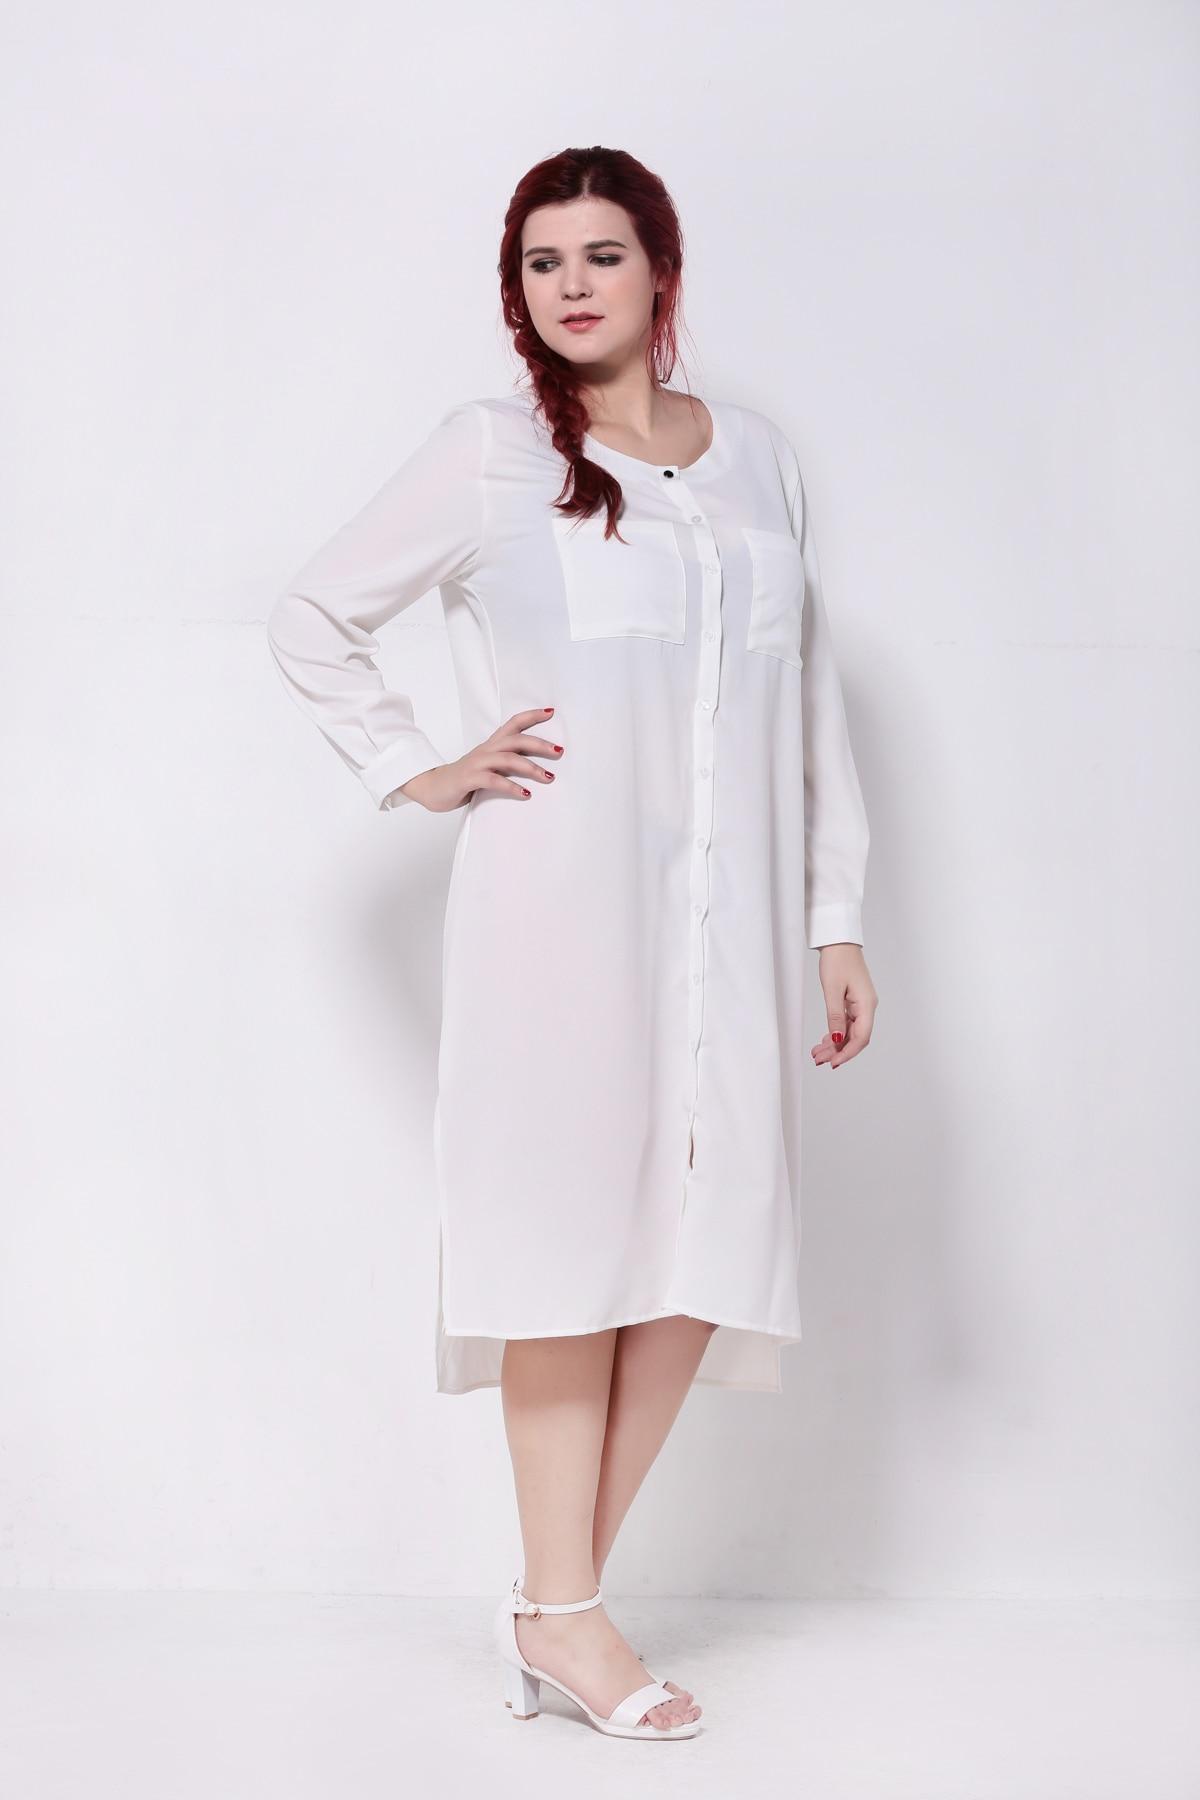 32c3aabd33 2016 Elegant Office Chiffon Shirt White Dress Vintage Maxi Dresses Women  Plus Size Long Sleeve Autumn Robe Femme 4XL 5XL 6XL 7xl-in Dresses from  Women's ...